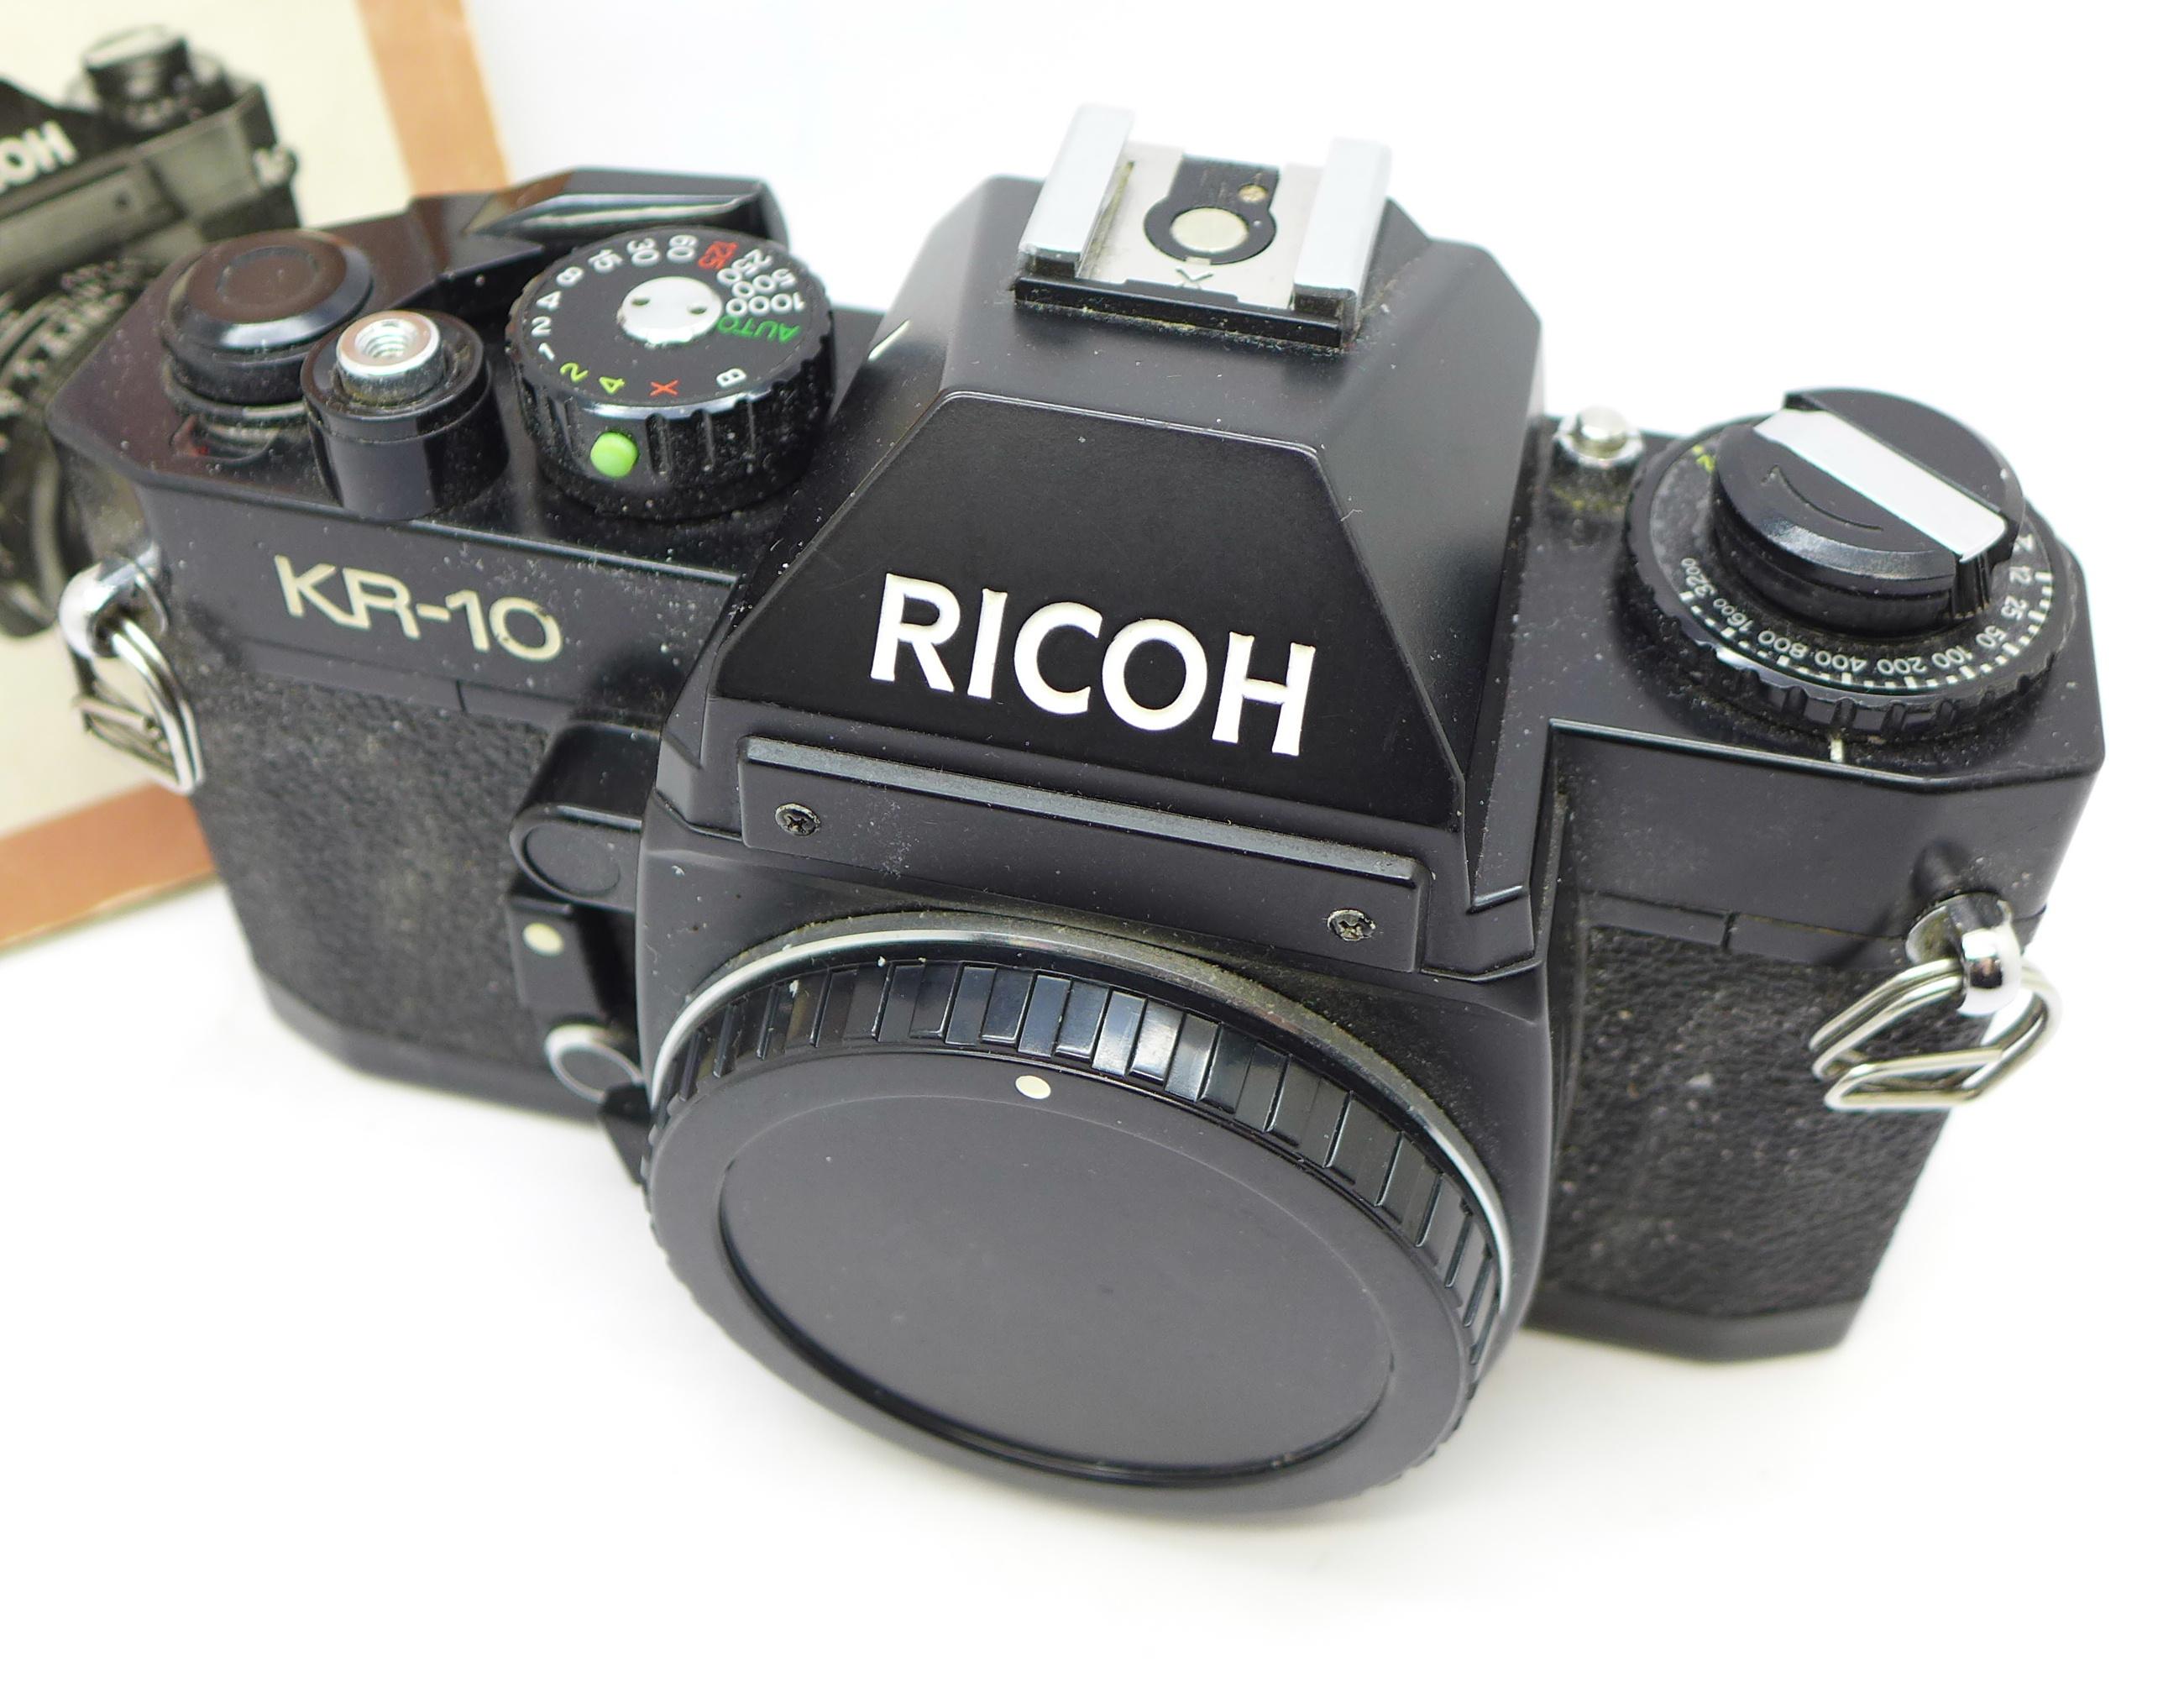 Lot 649 - A Ricoh KR-10 camera body and manual